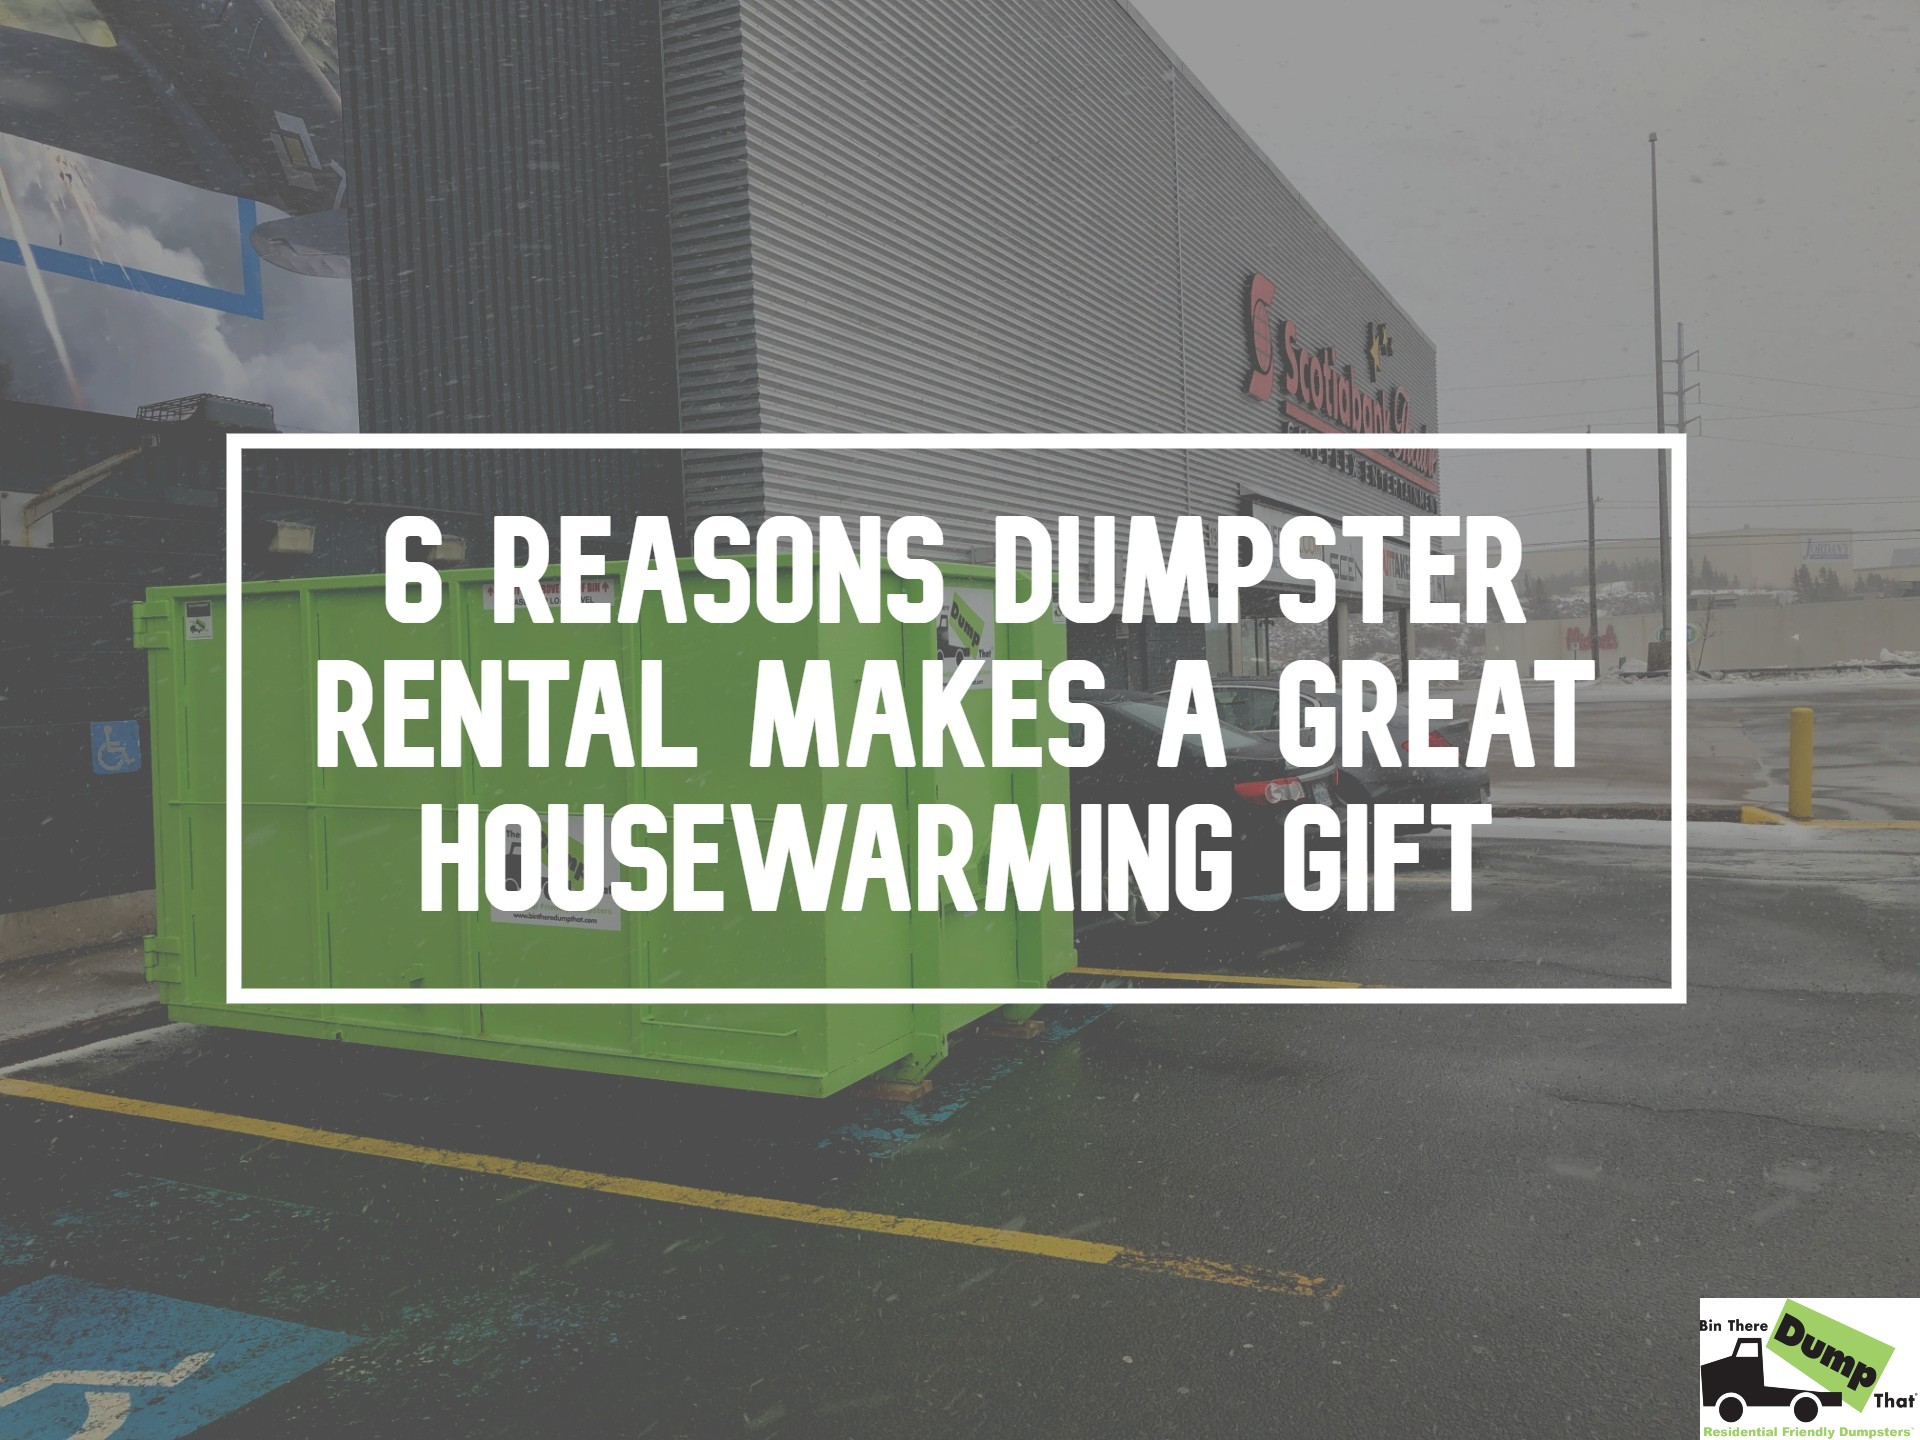 dumpster-rental-housewarming-gift-new